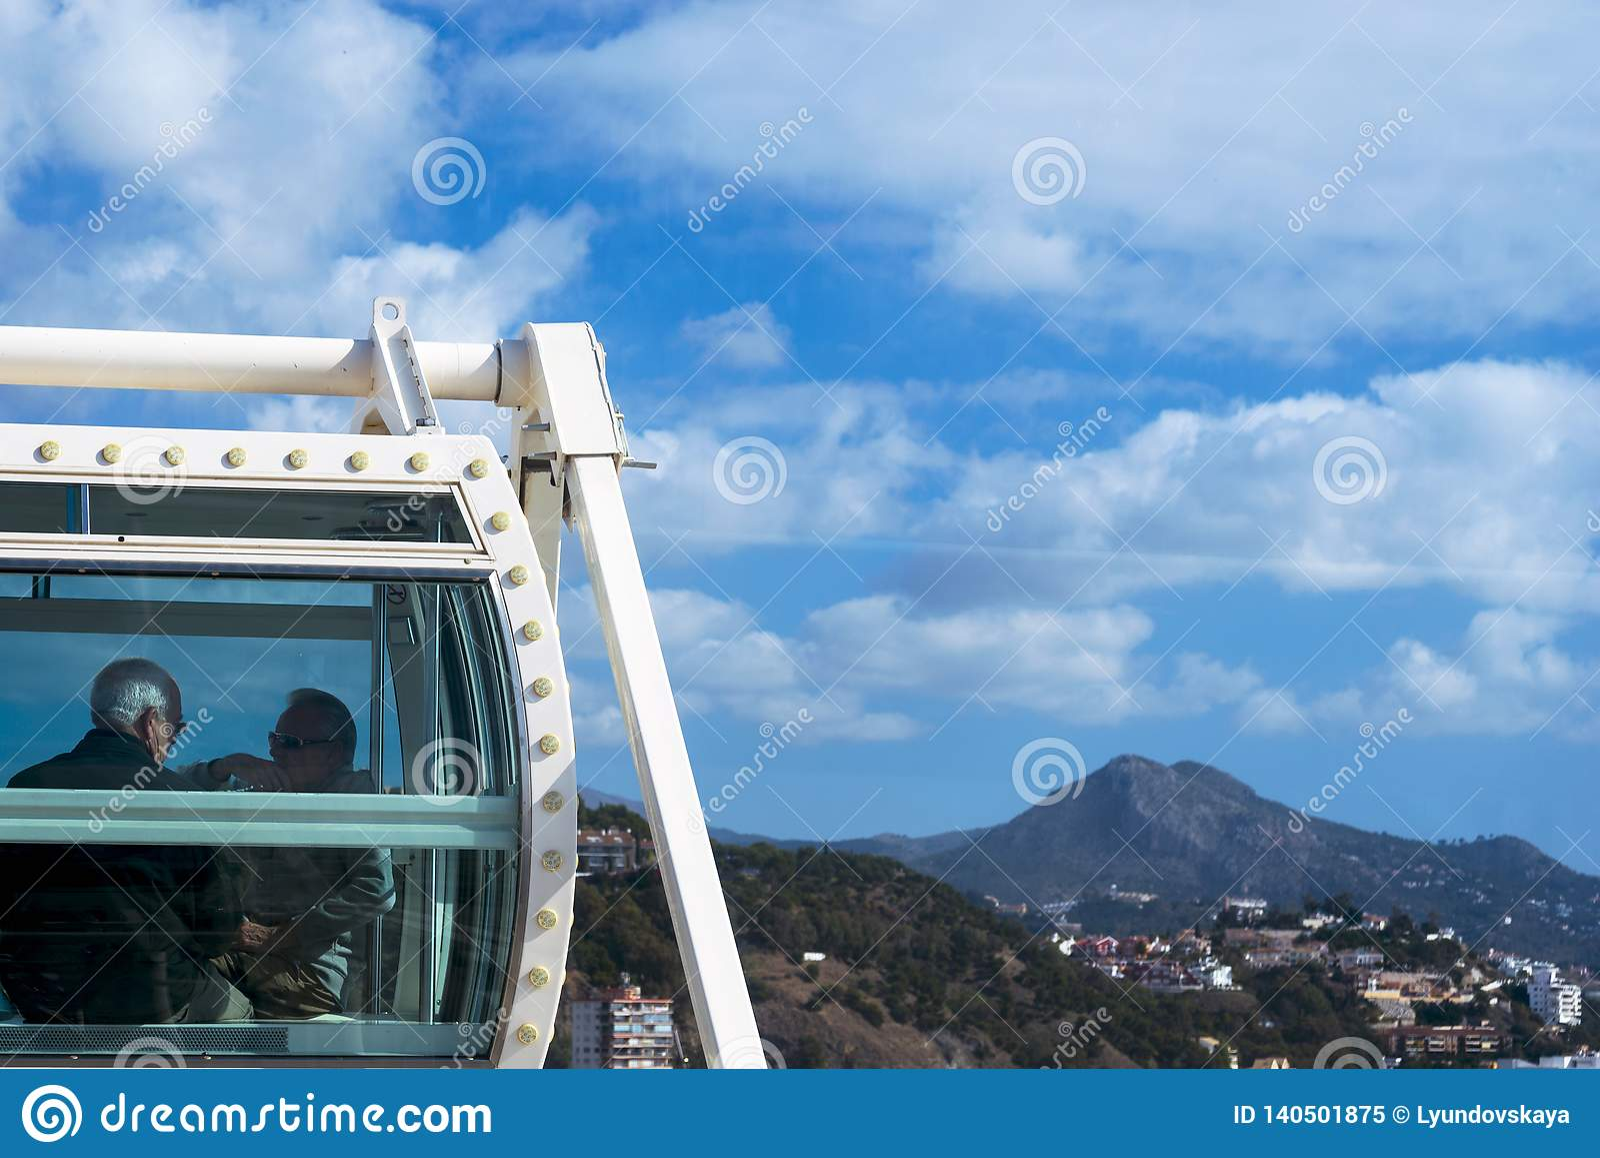 Les gens visitant la ville espagnole de Malaga de la cabine de la grande roue Voyagent des couples plus anciens